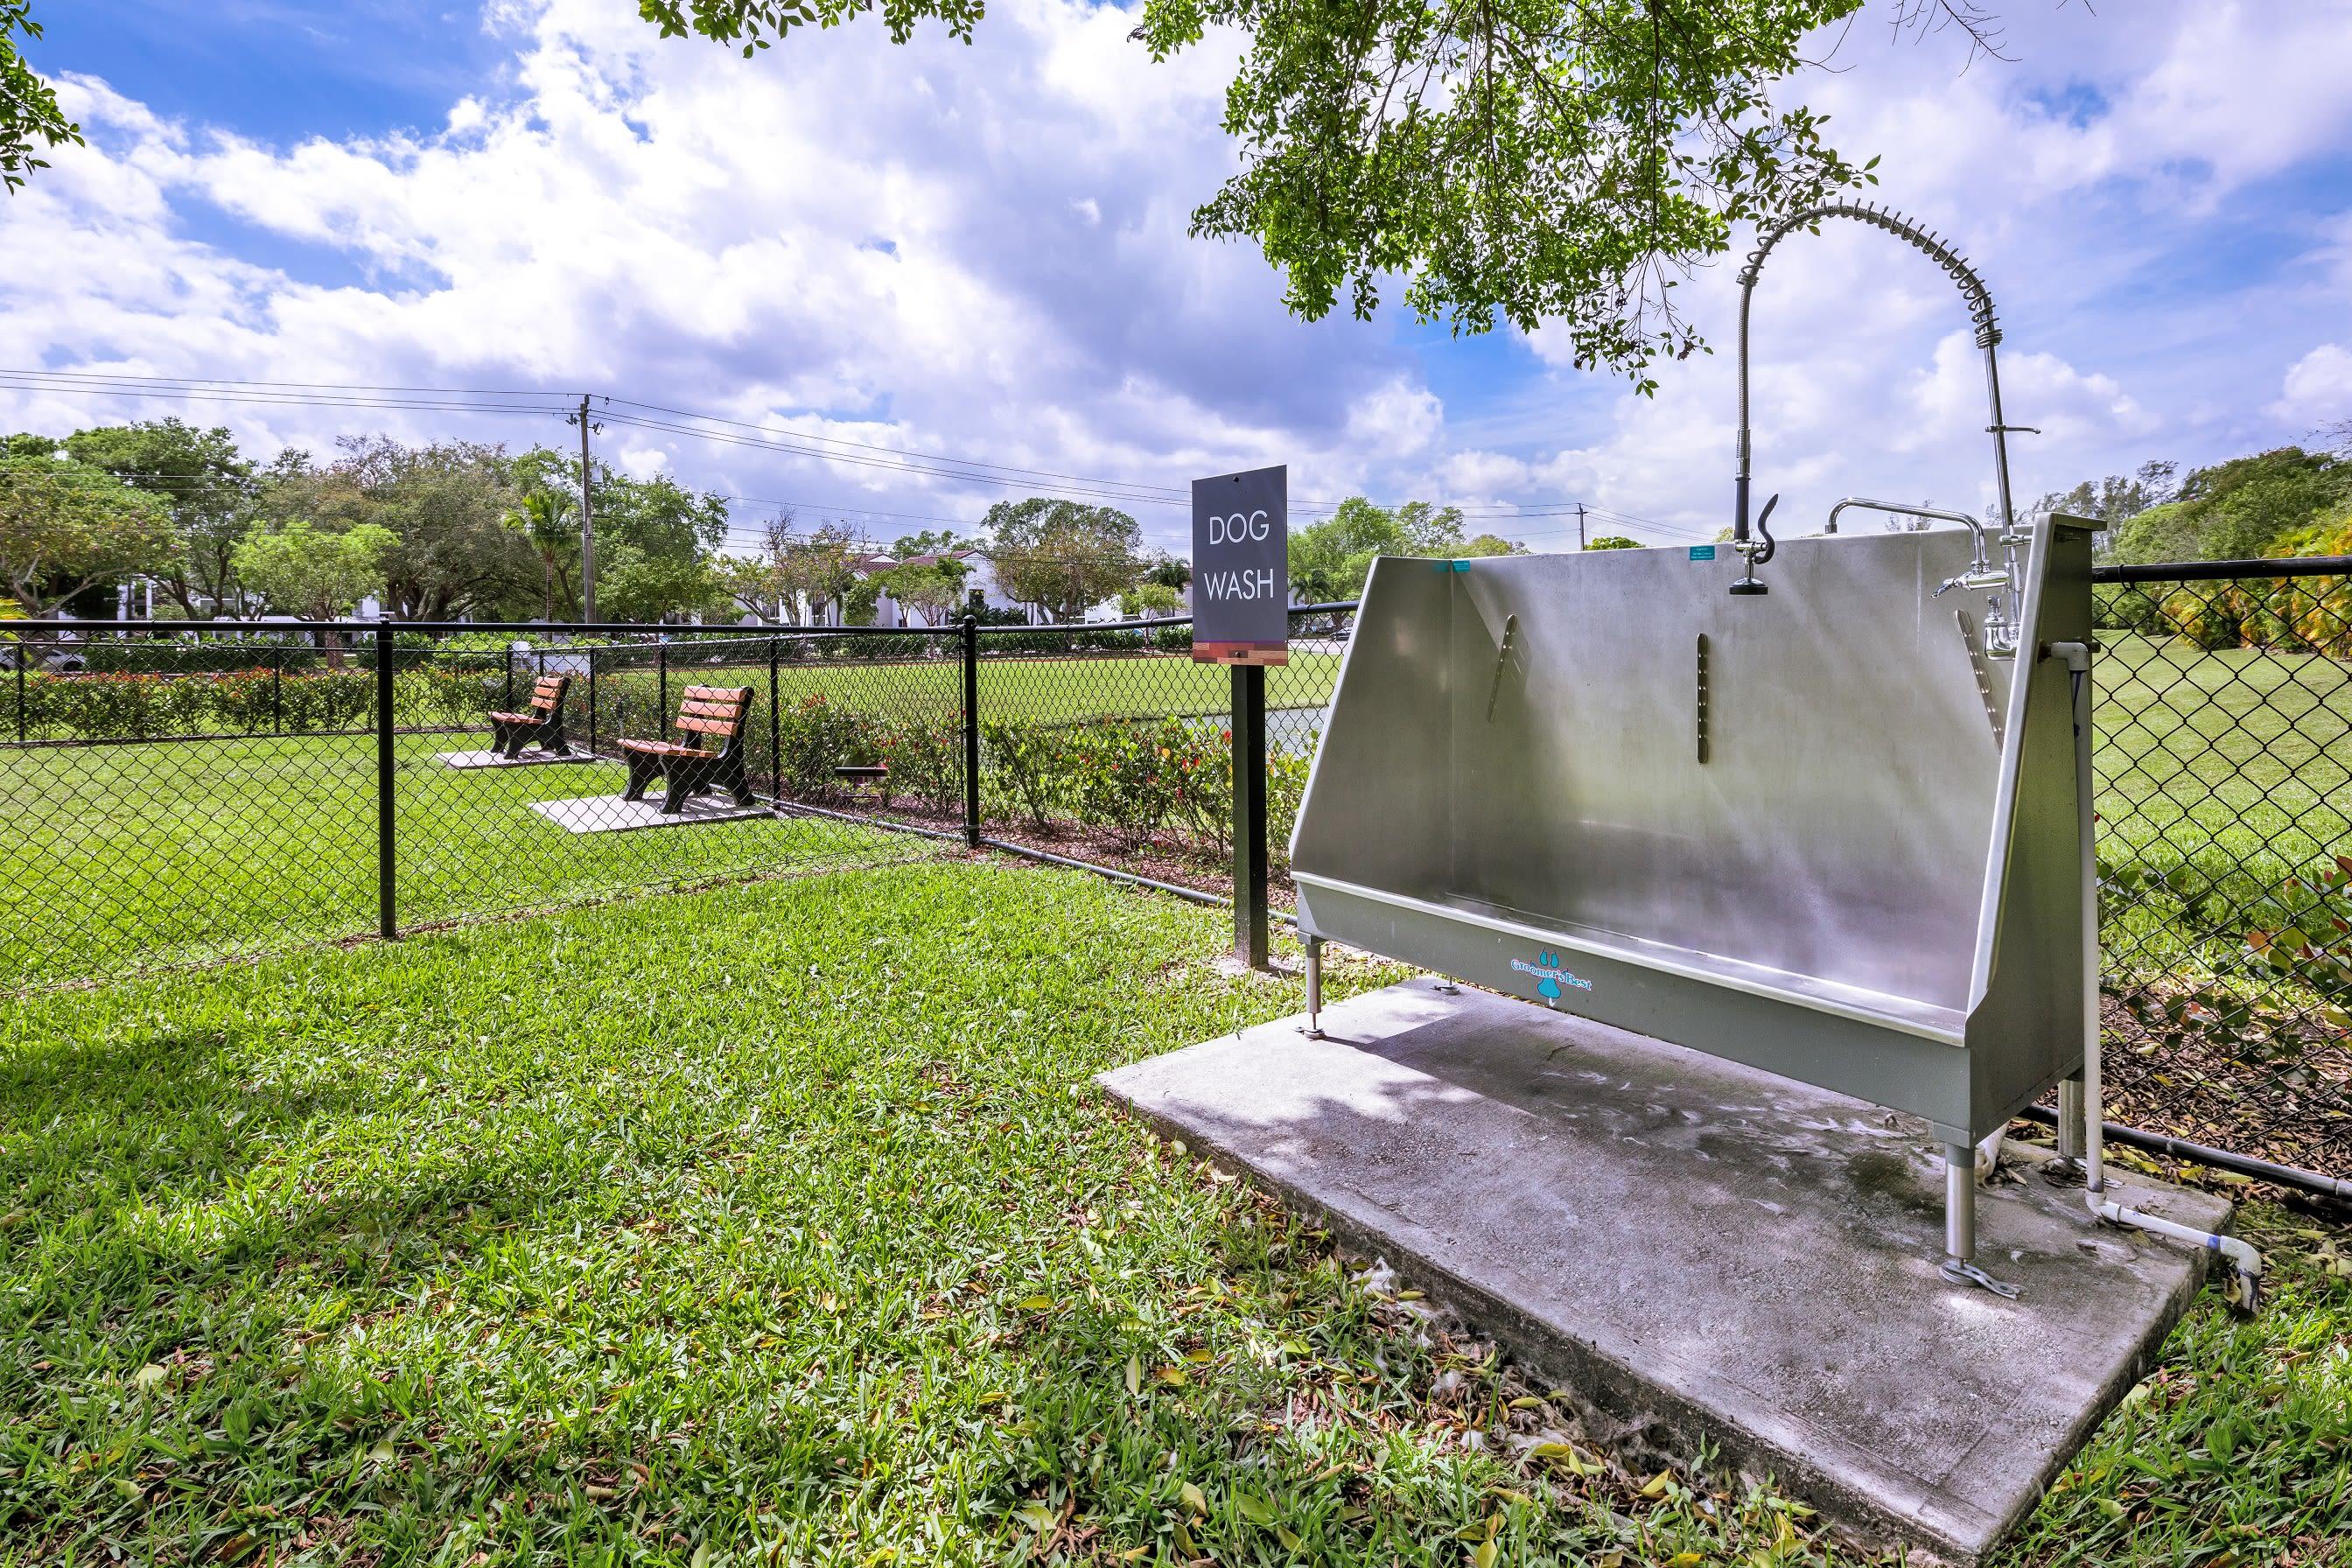 Dog wash station by dog park near Cielo Boca in Boca Raton, Florida